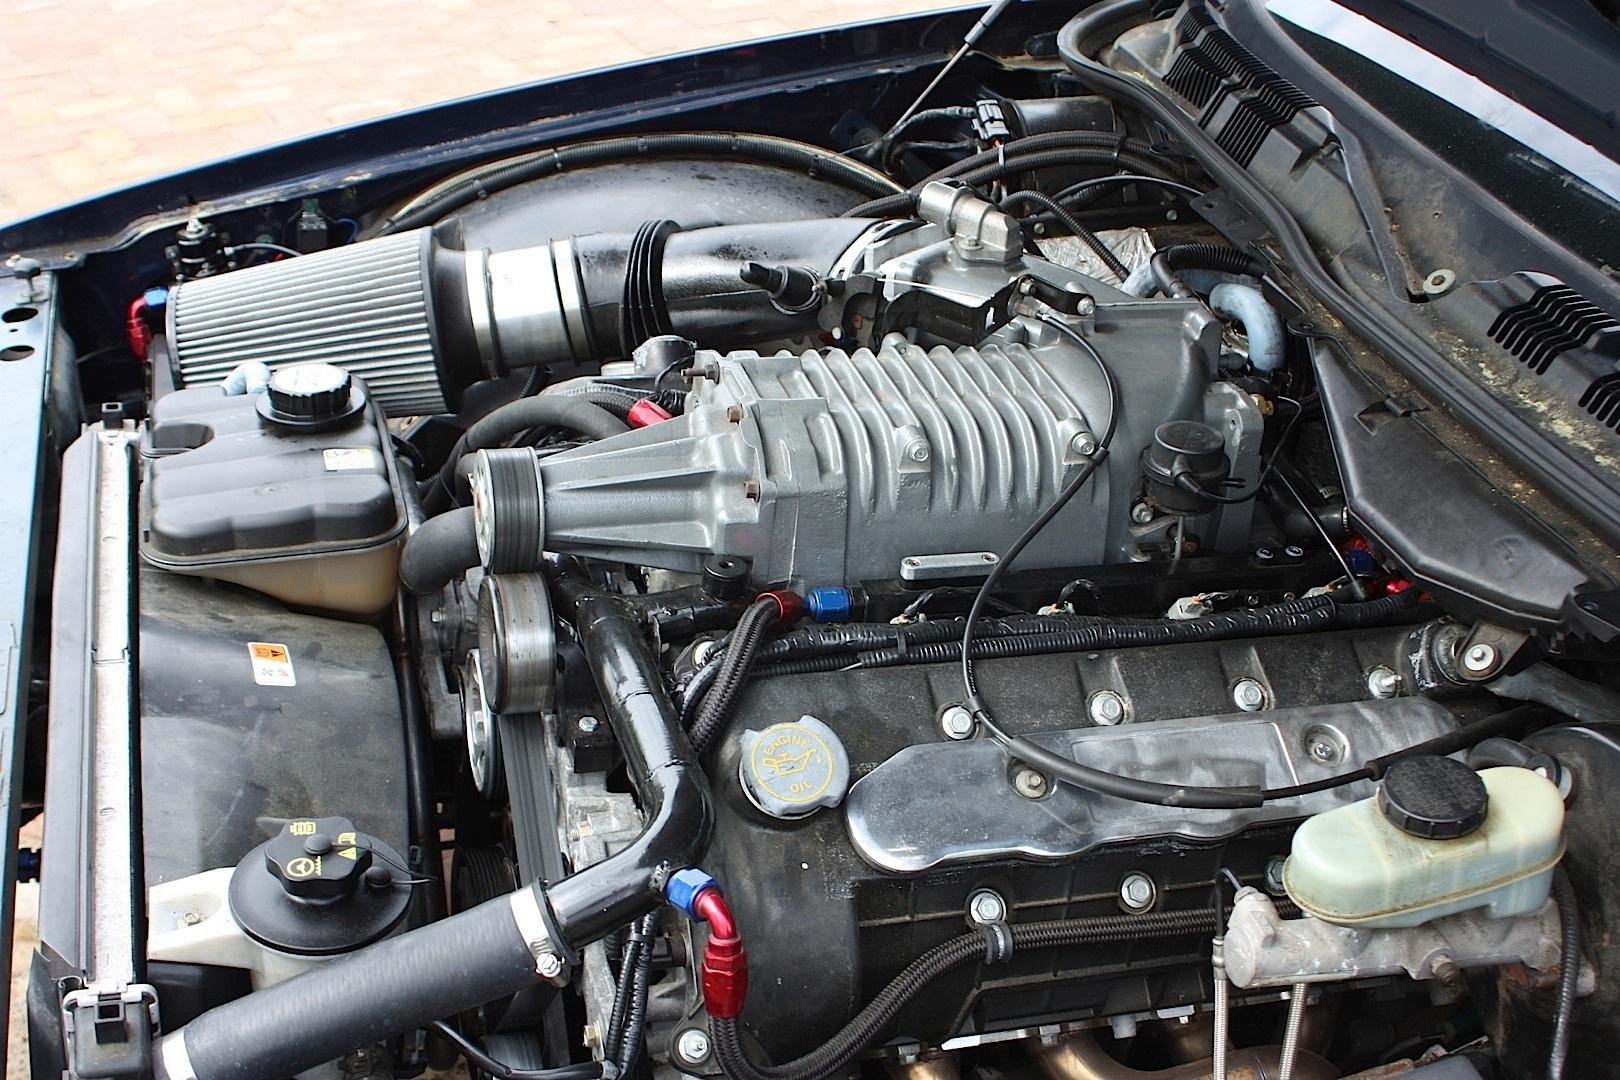 2003 Grand Marquis Wiring Diagram Retired Crown Victoria Police Interceptor Gets Mustang